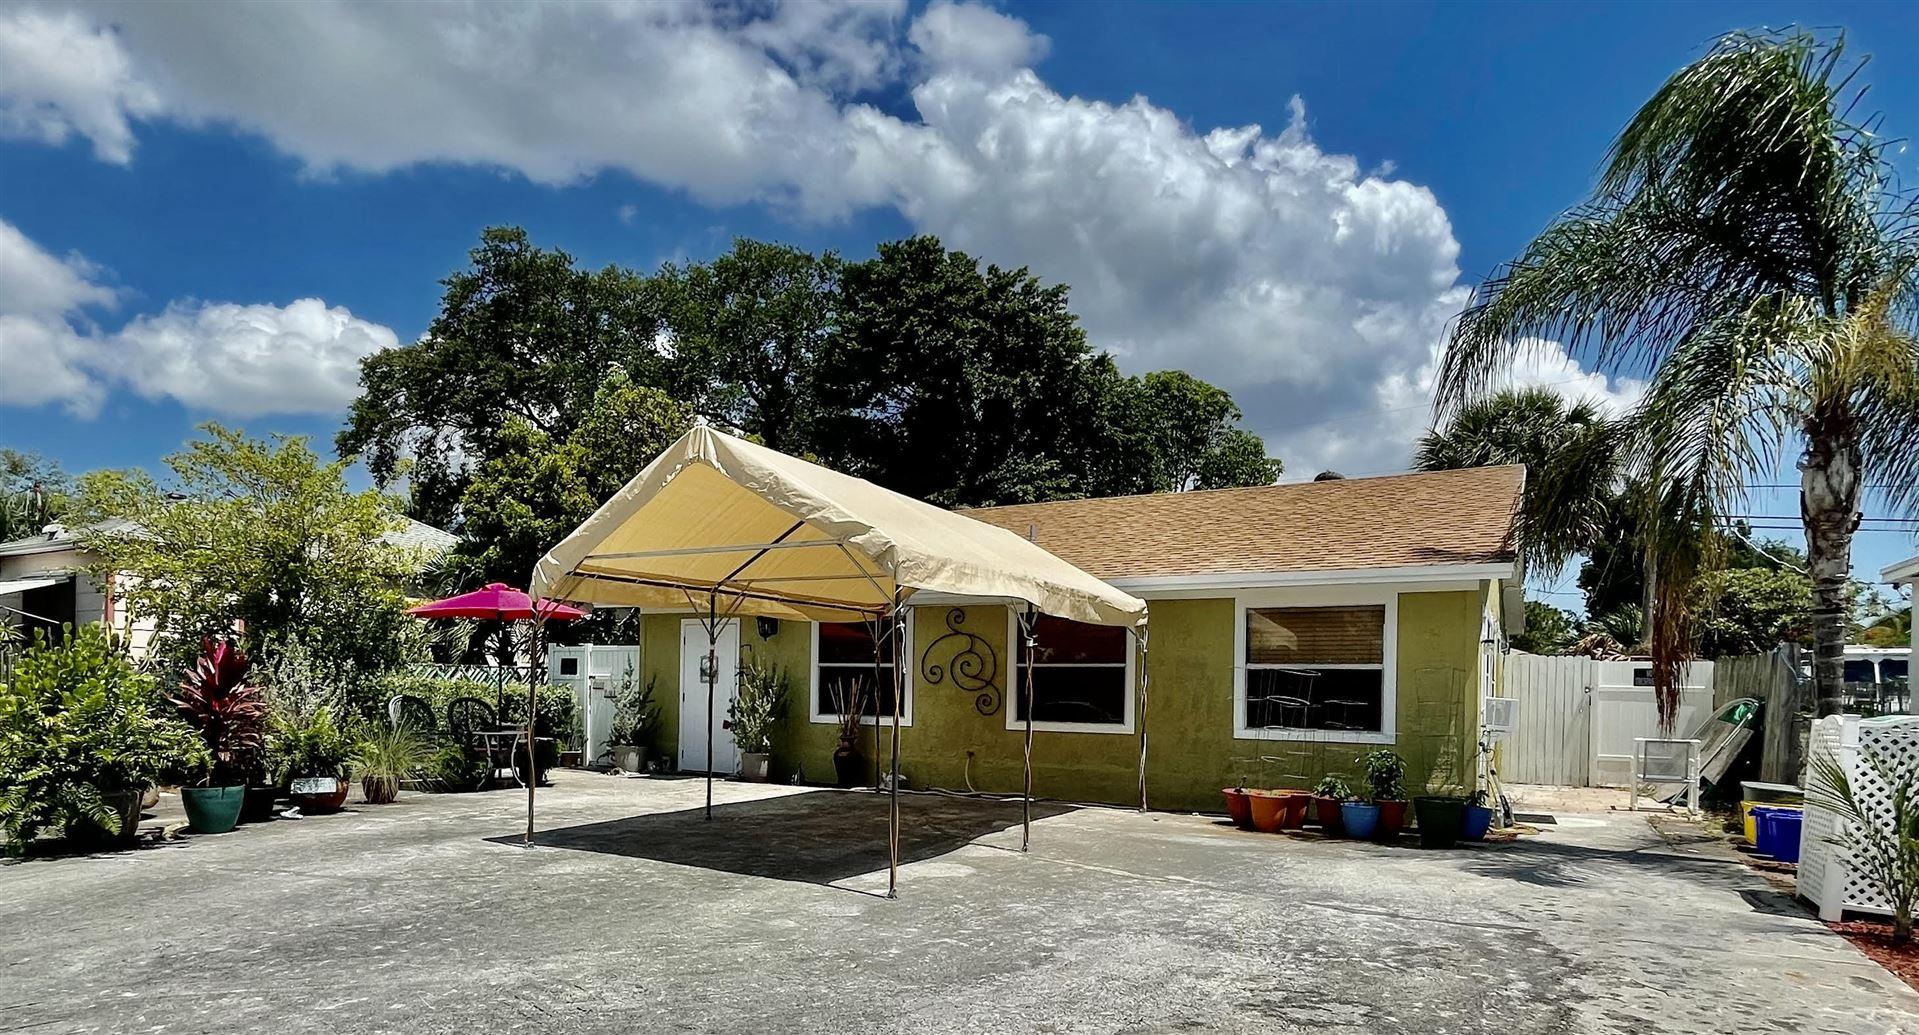 122 E 22nd Court, Riviera Beach, FL 33404 - MLS#: RX-10721468